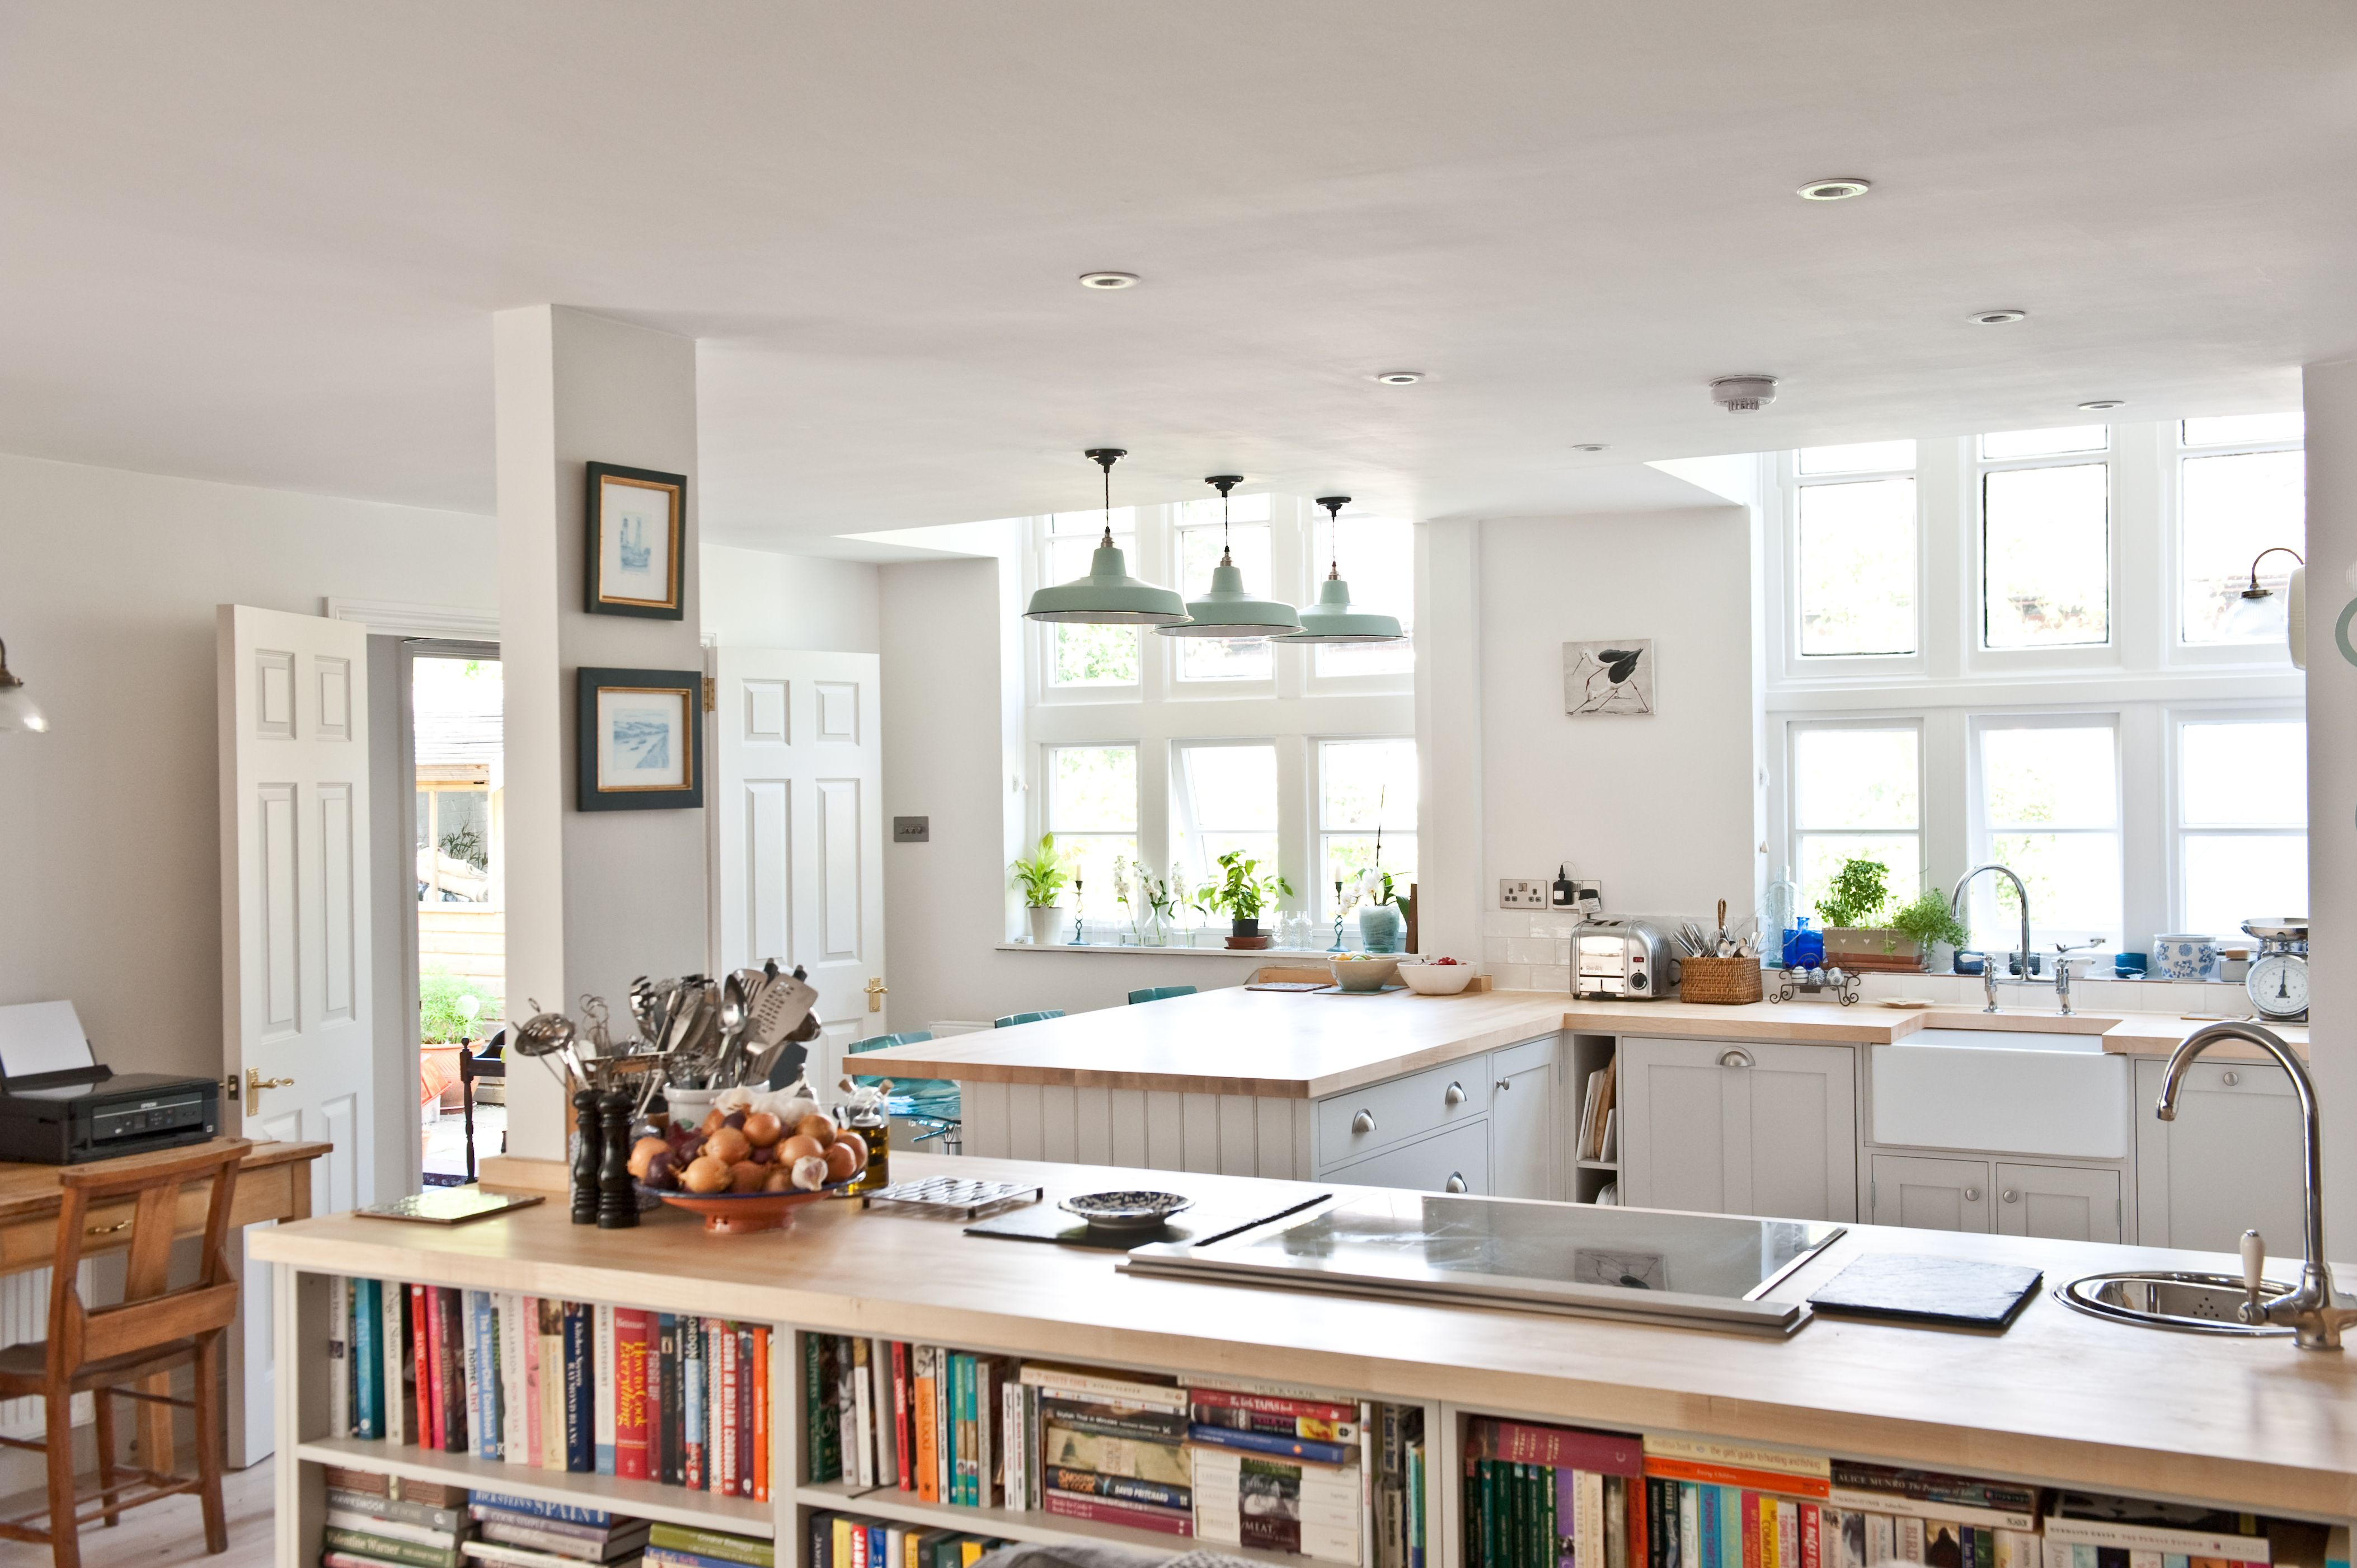 23 best Pineland Kitchen images on Pinterest | Angles, Kitchen ideas ...